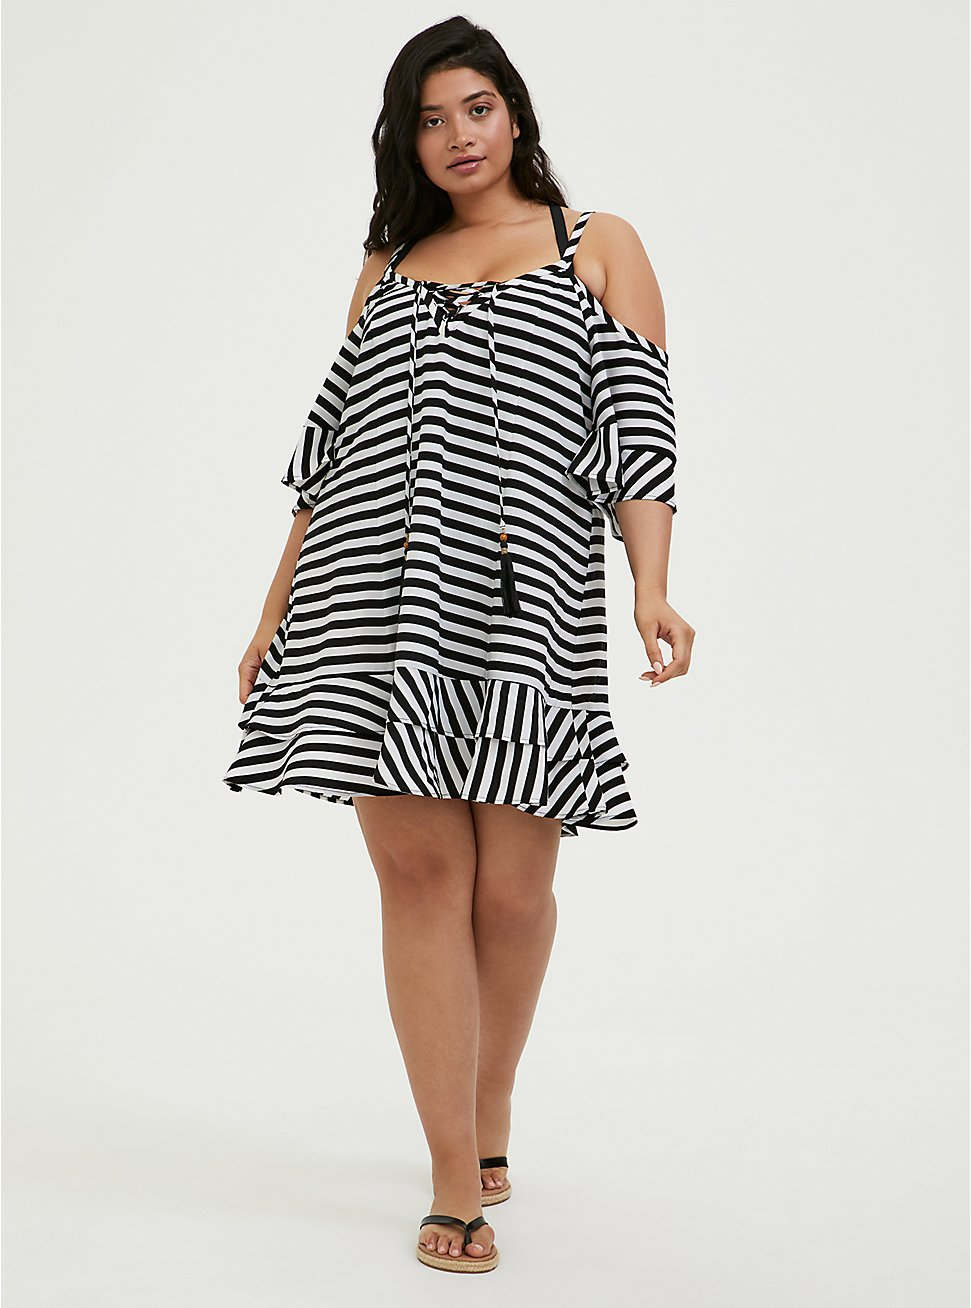 Plus Size Black & White Stripe Crinkled Chiffon Cold Shoulder Dress Swim Cover-Up, MULTI, hi-res